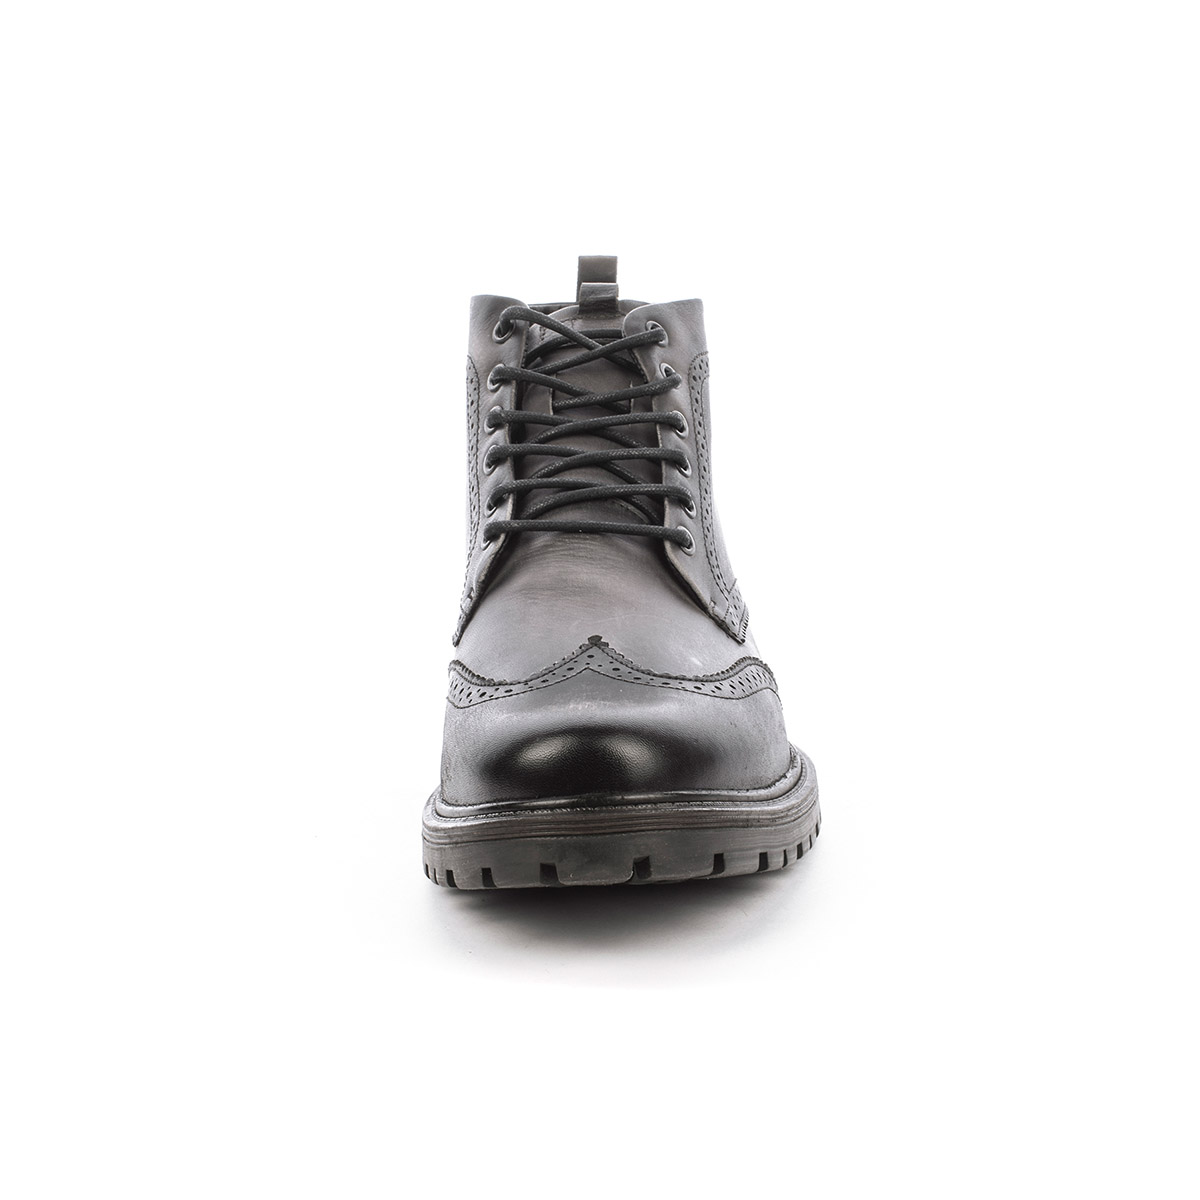 Botín Casual Soho Negro Max Denegri + 7cms de Altura_76491